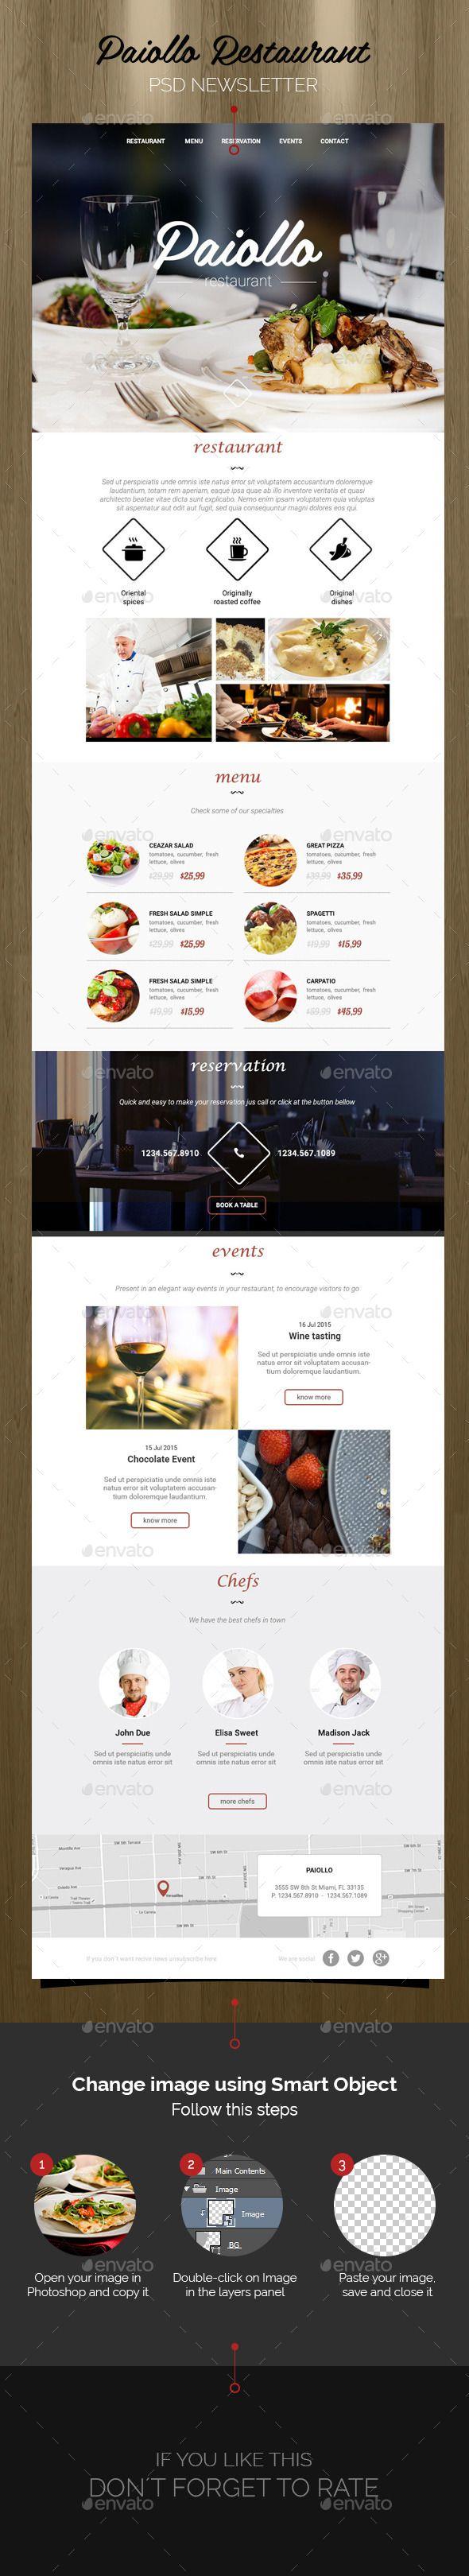 Paiollo Restaurant - Newsletter Template PSD - E-newsletters Web ...